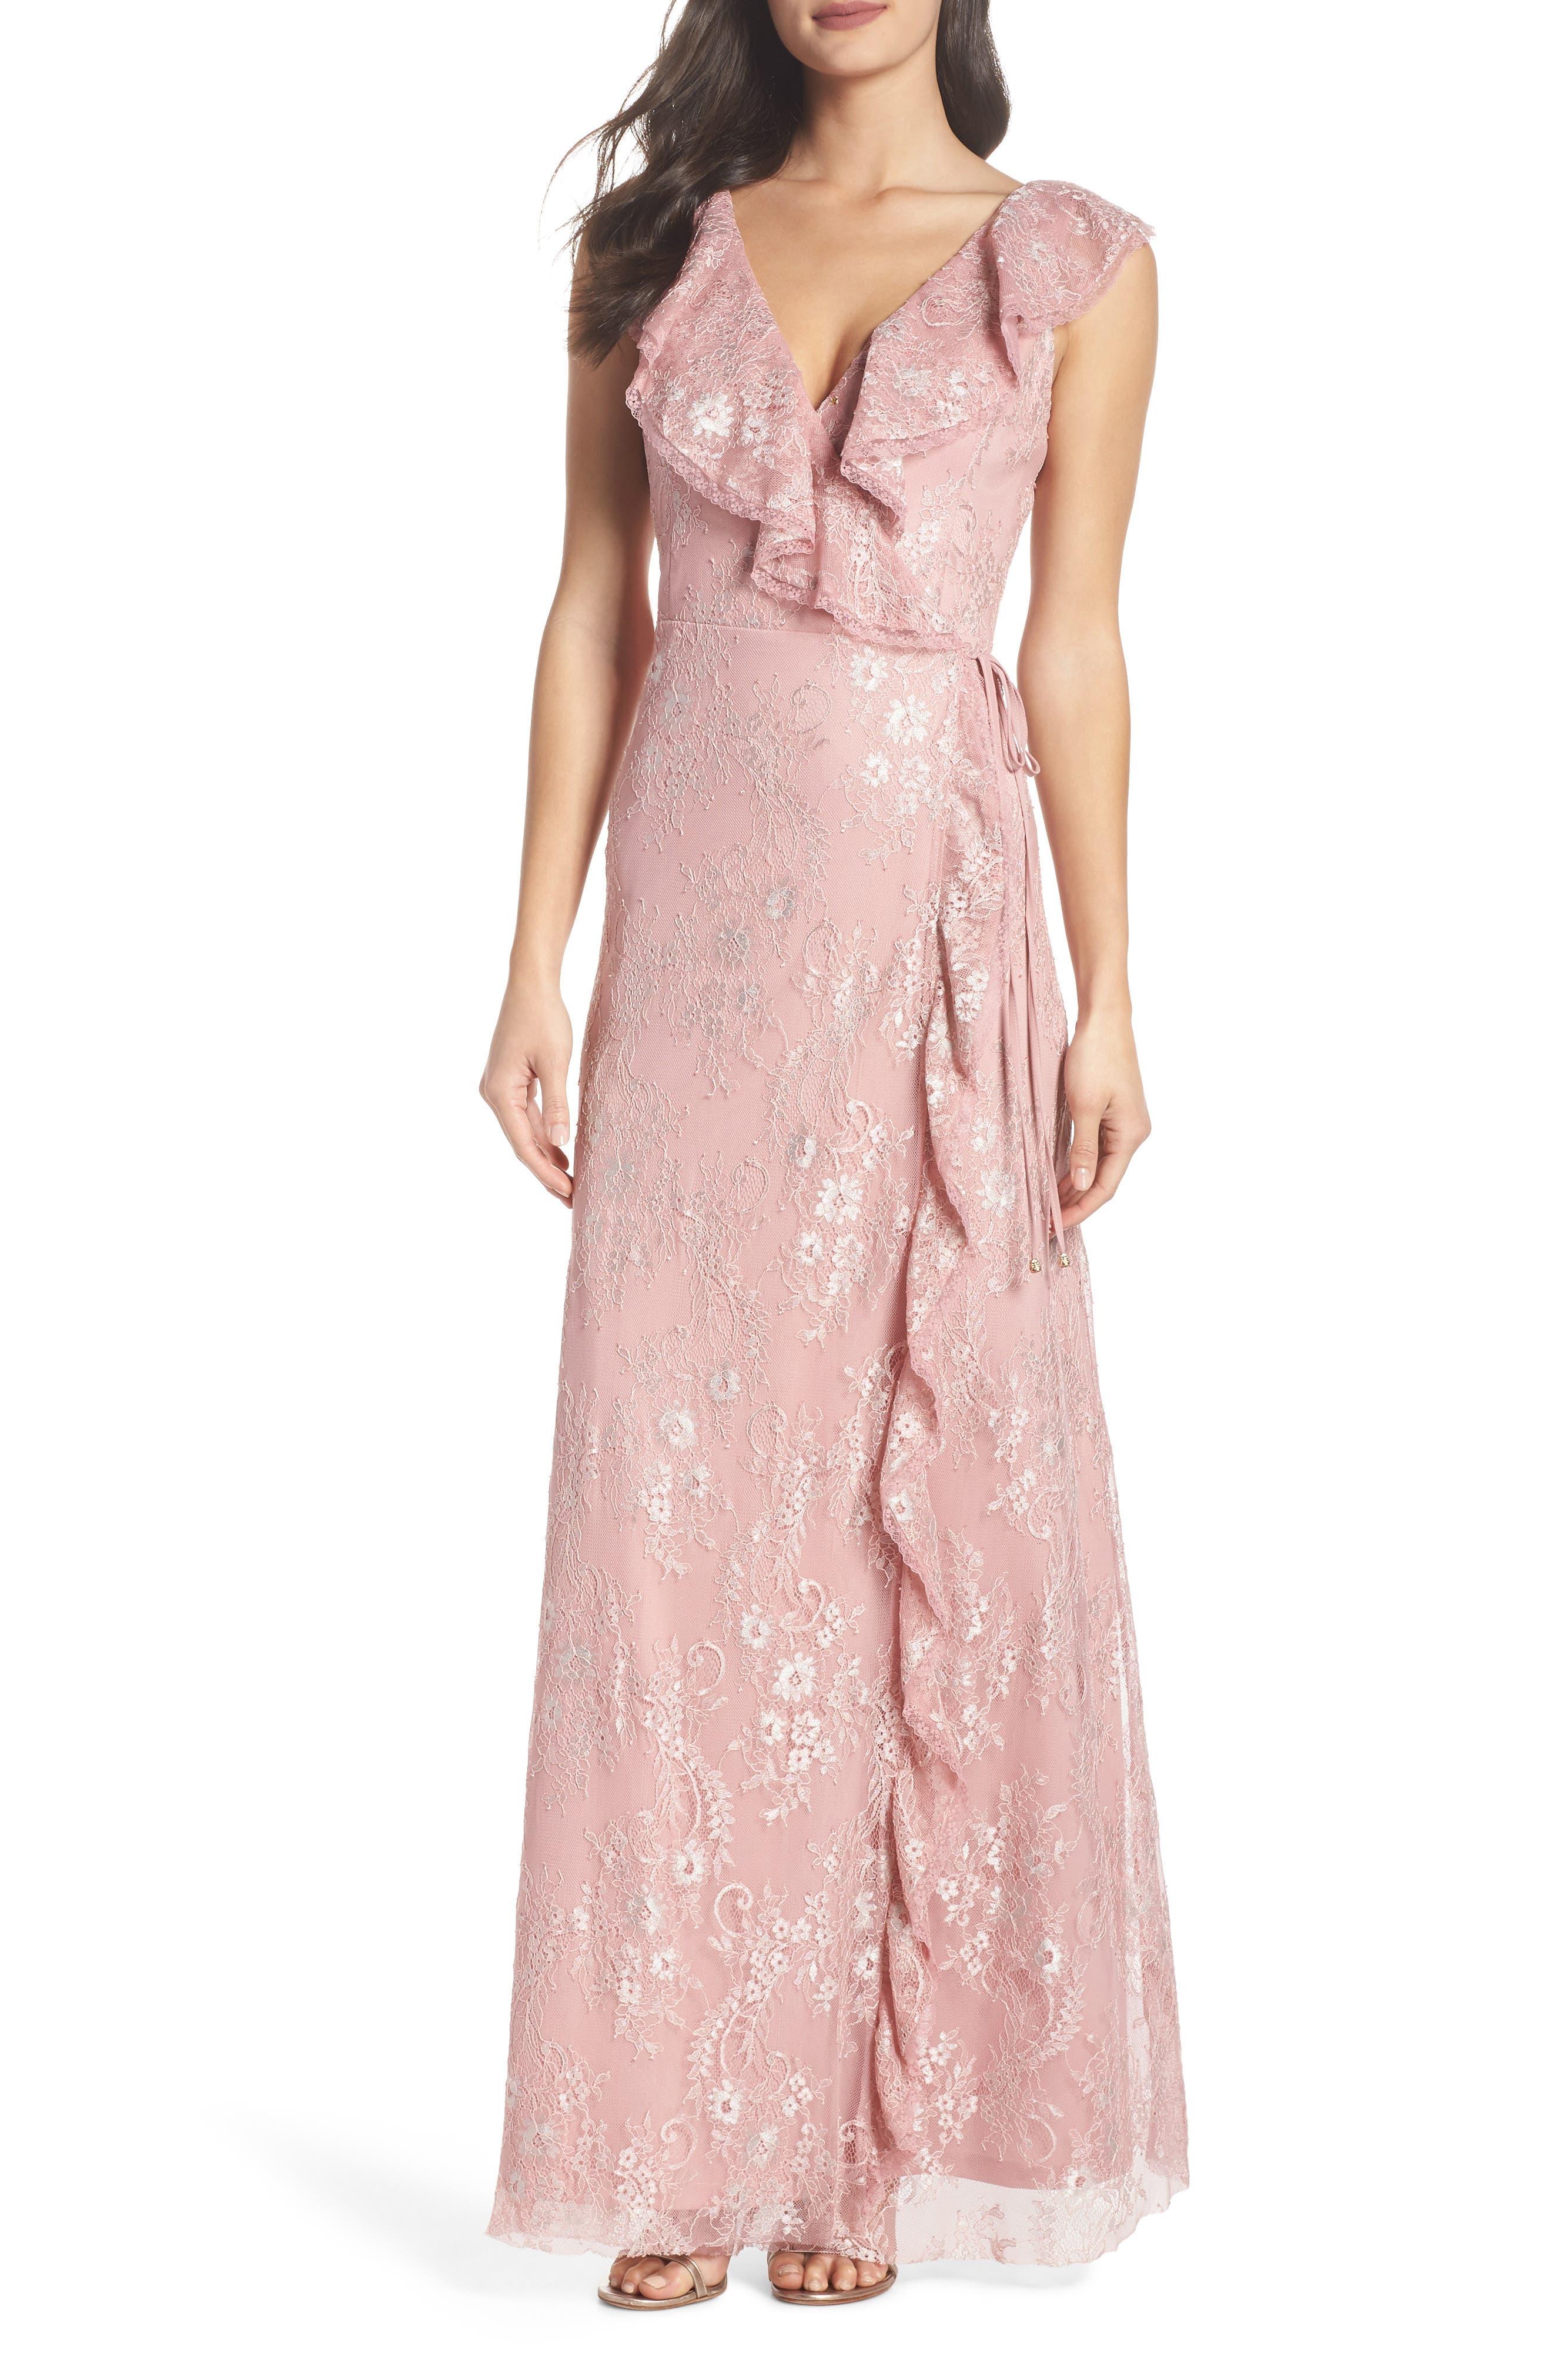 Rio Ruffle Lace Wrap Gown,                             Main thumbnail 1, color,                             Calypso